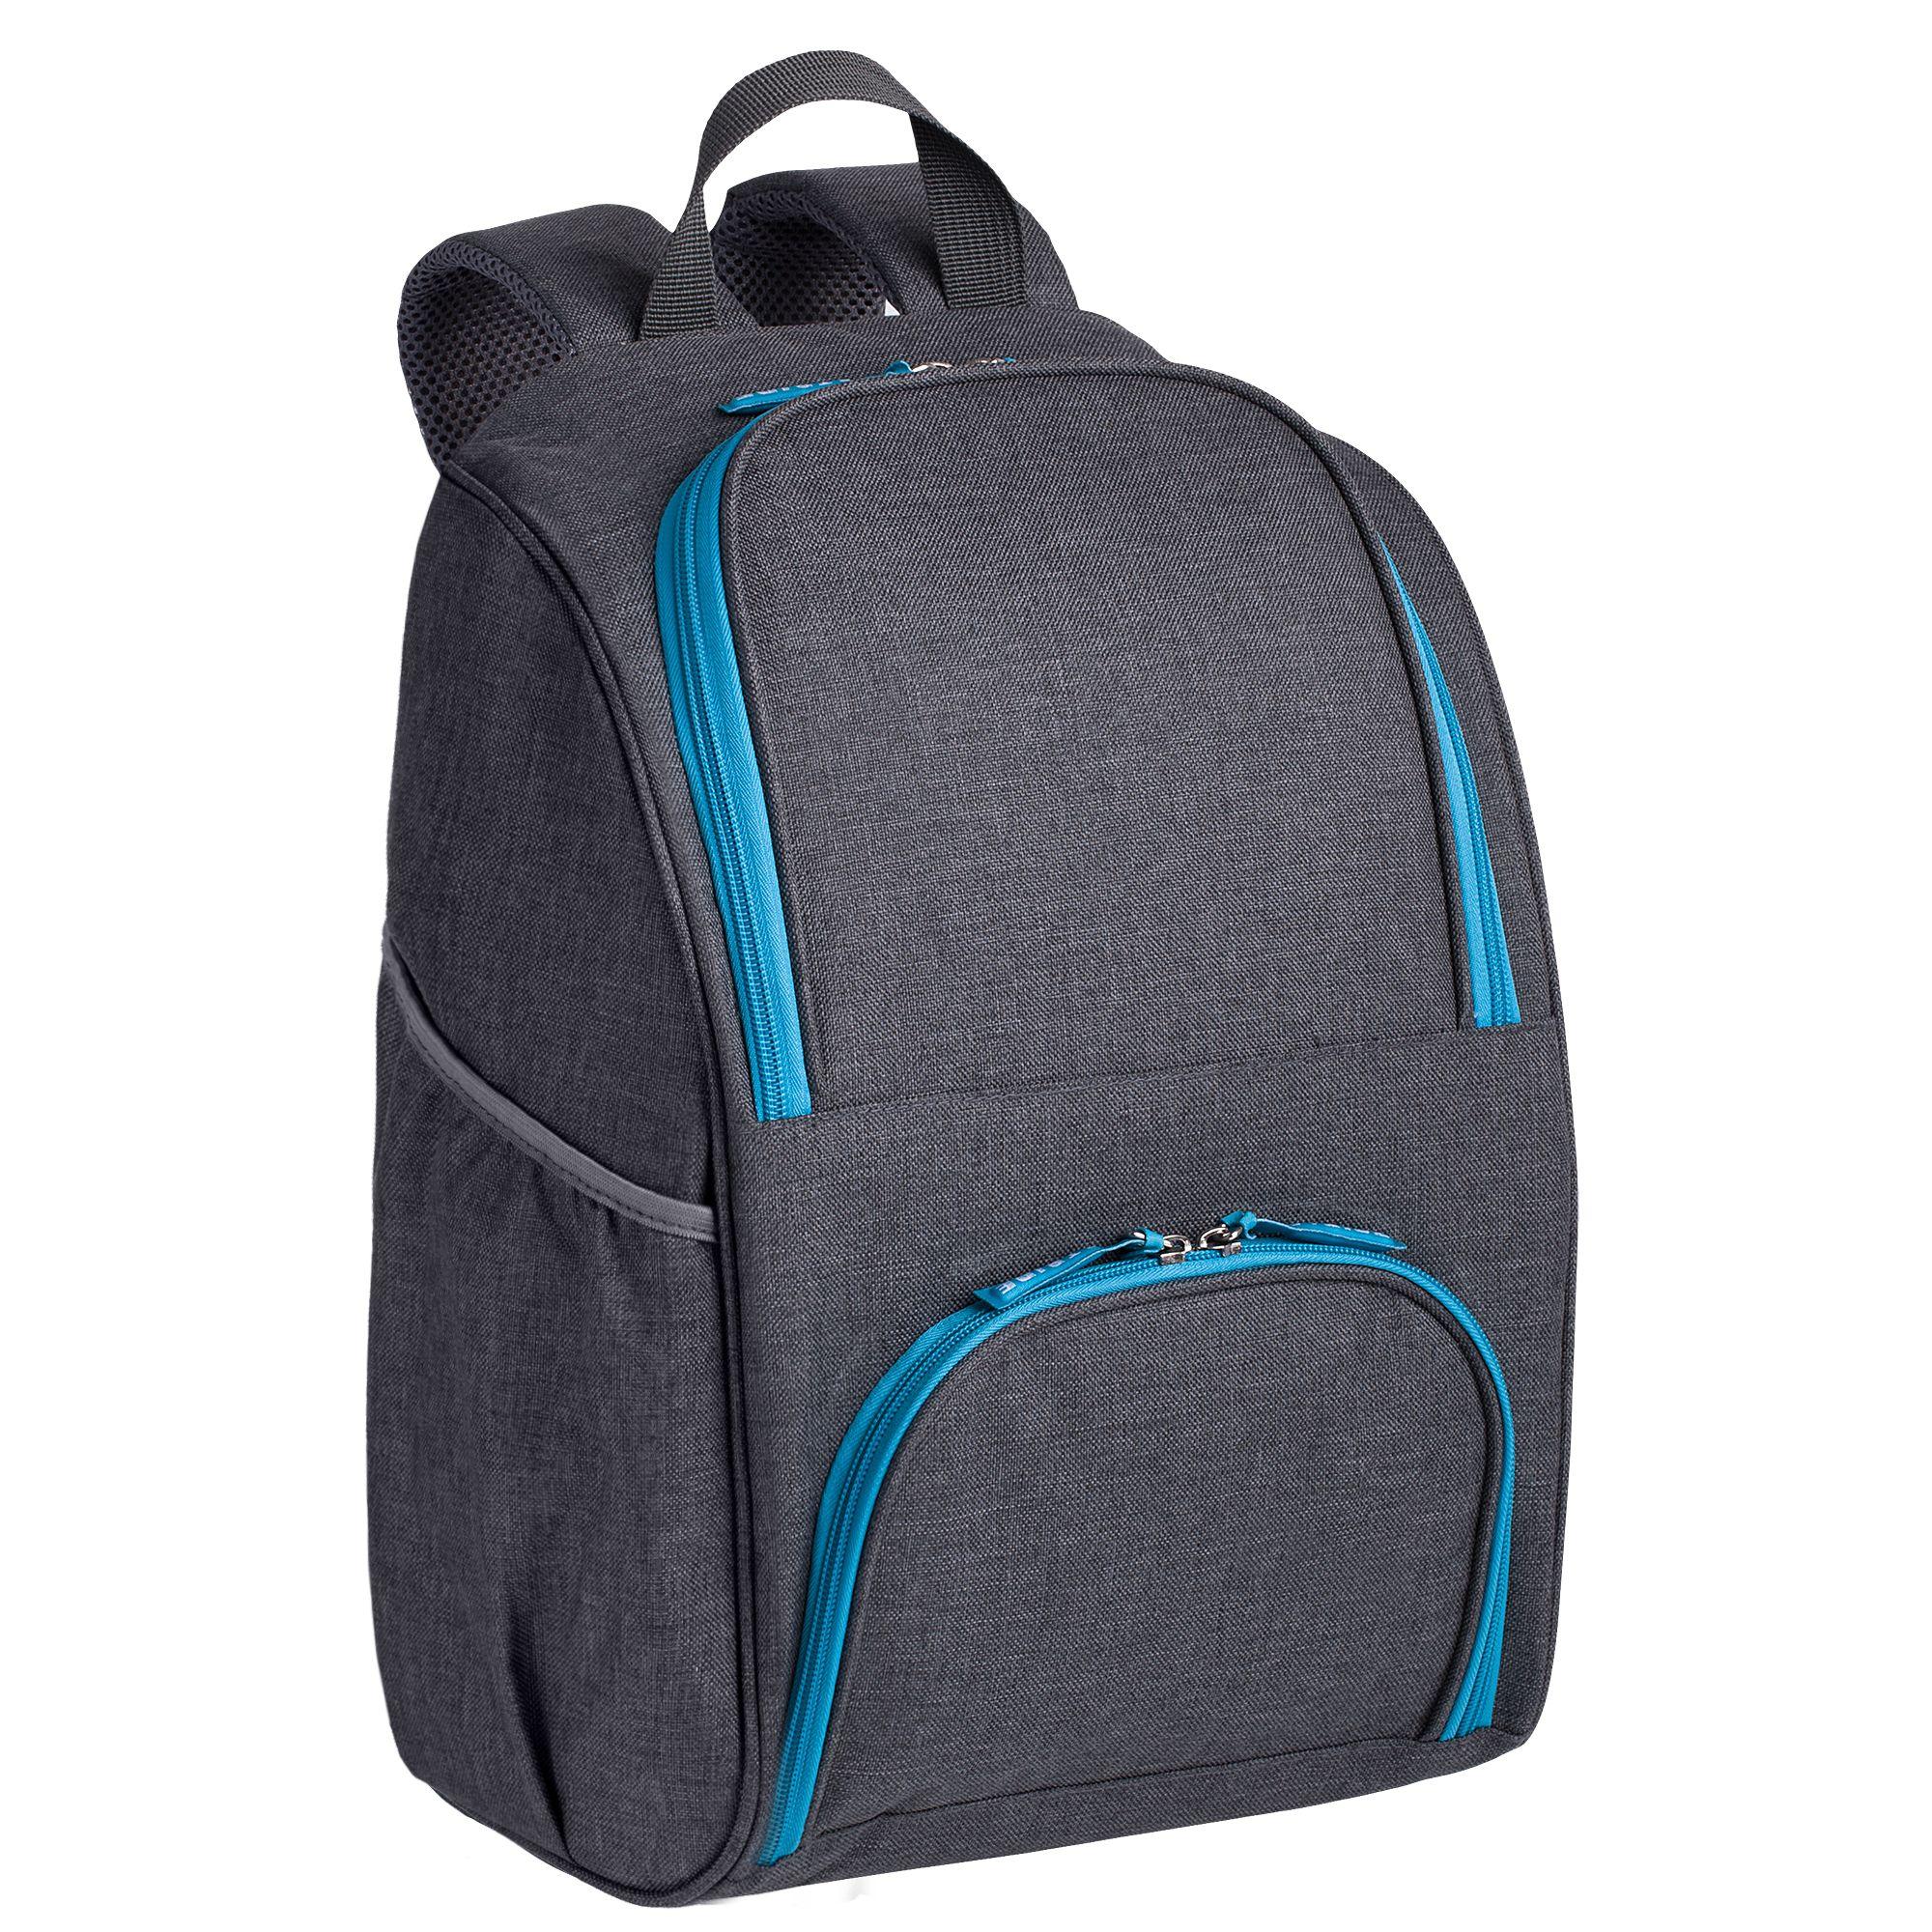 Рюкзак Stride Liten Fest, серый, синий